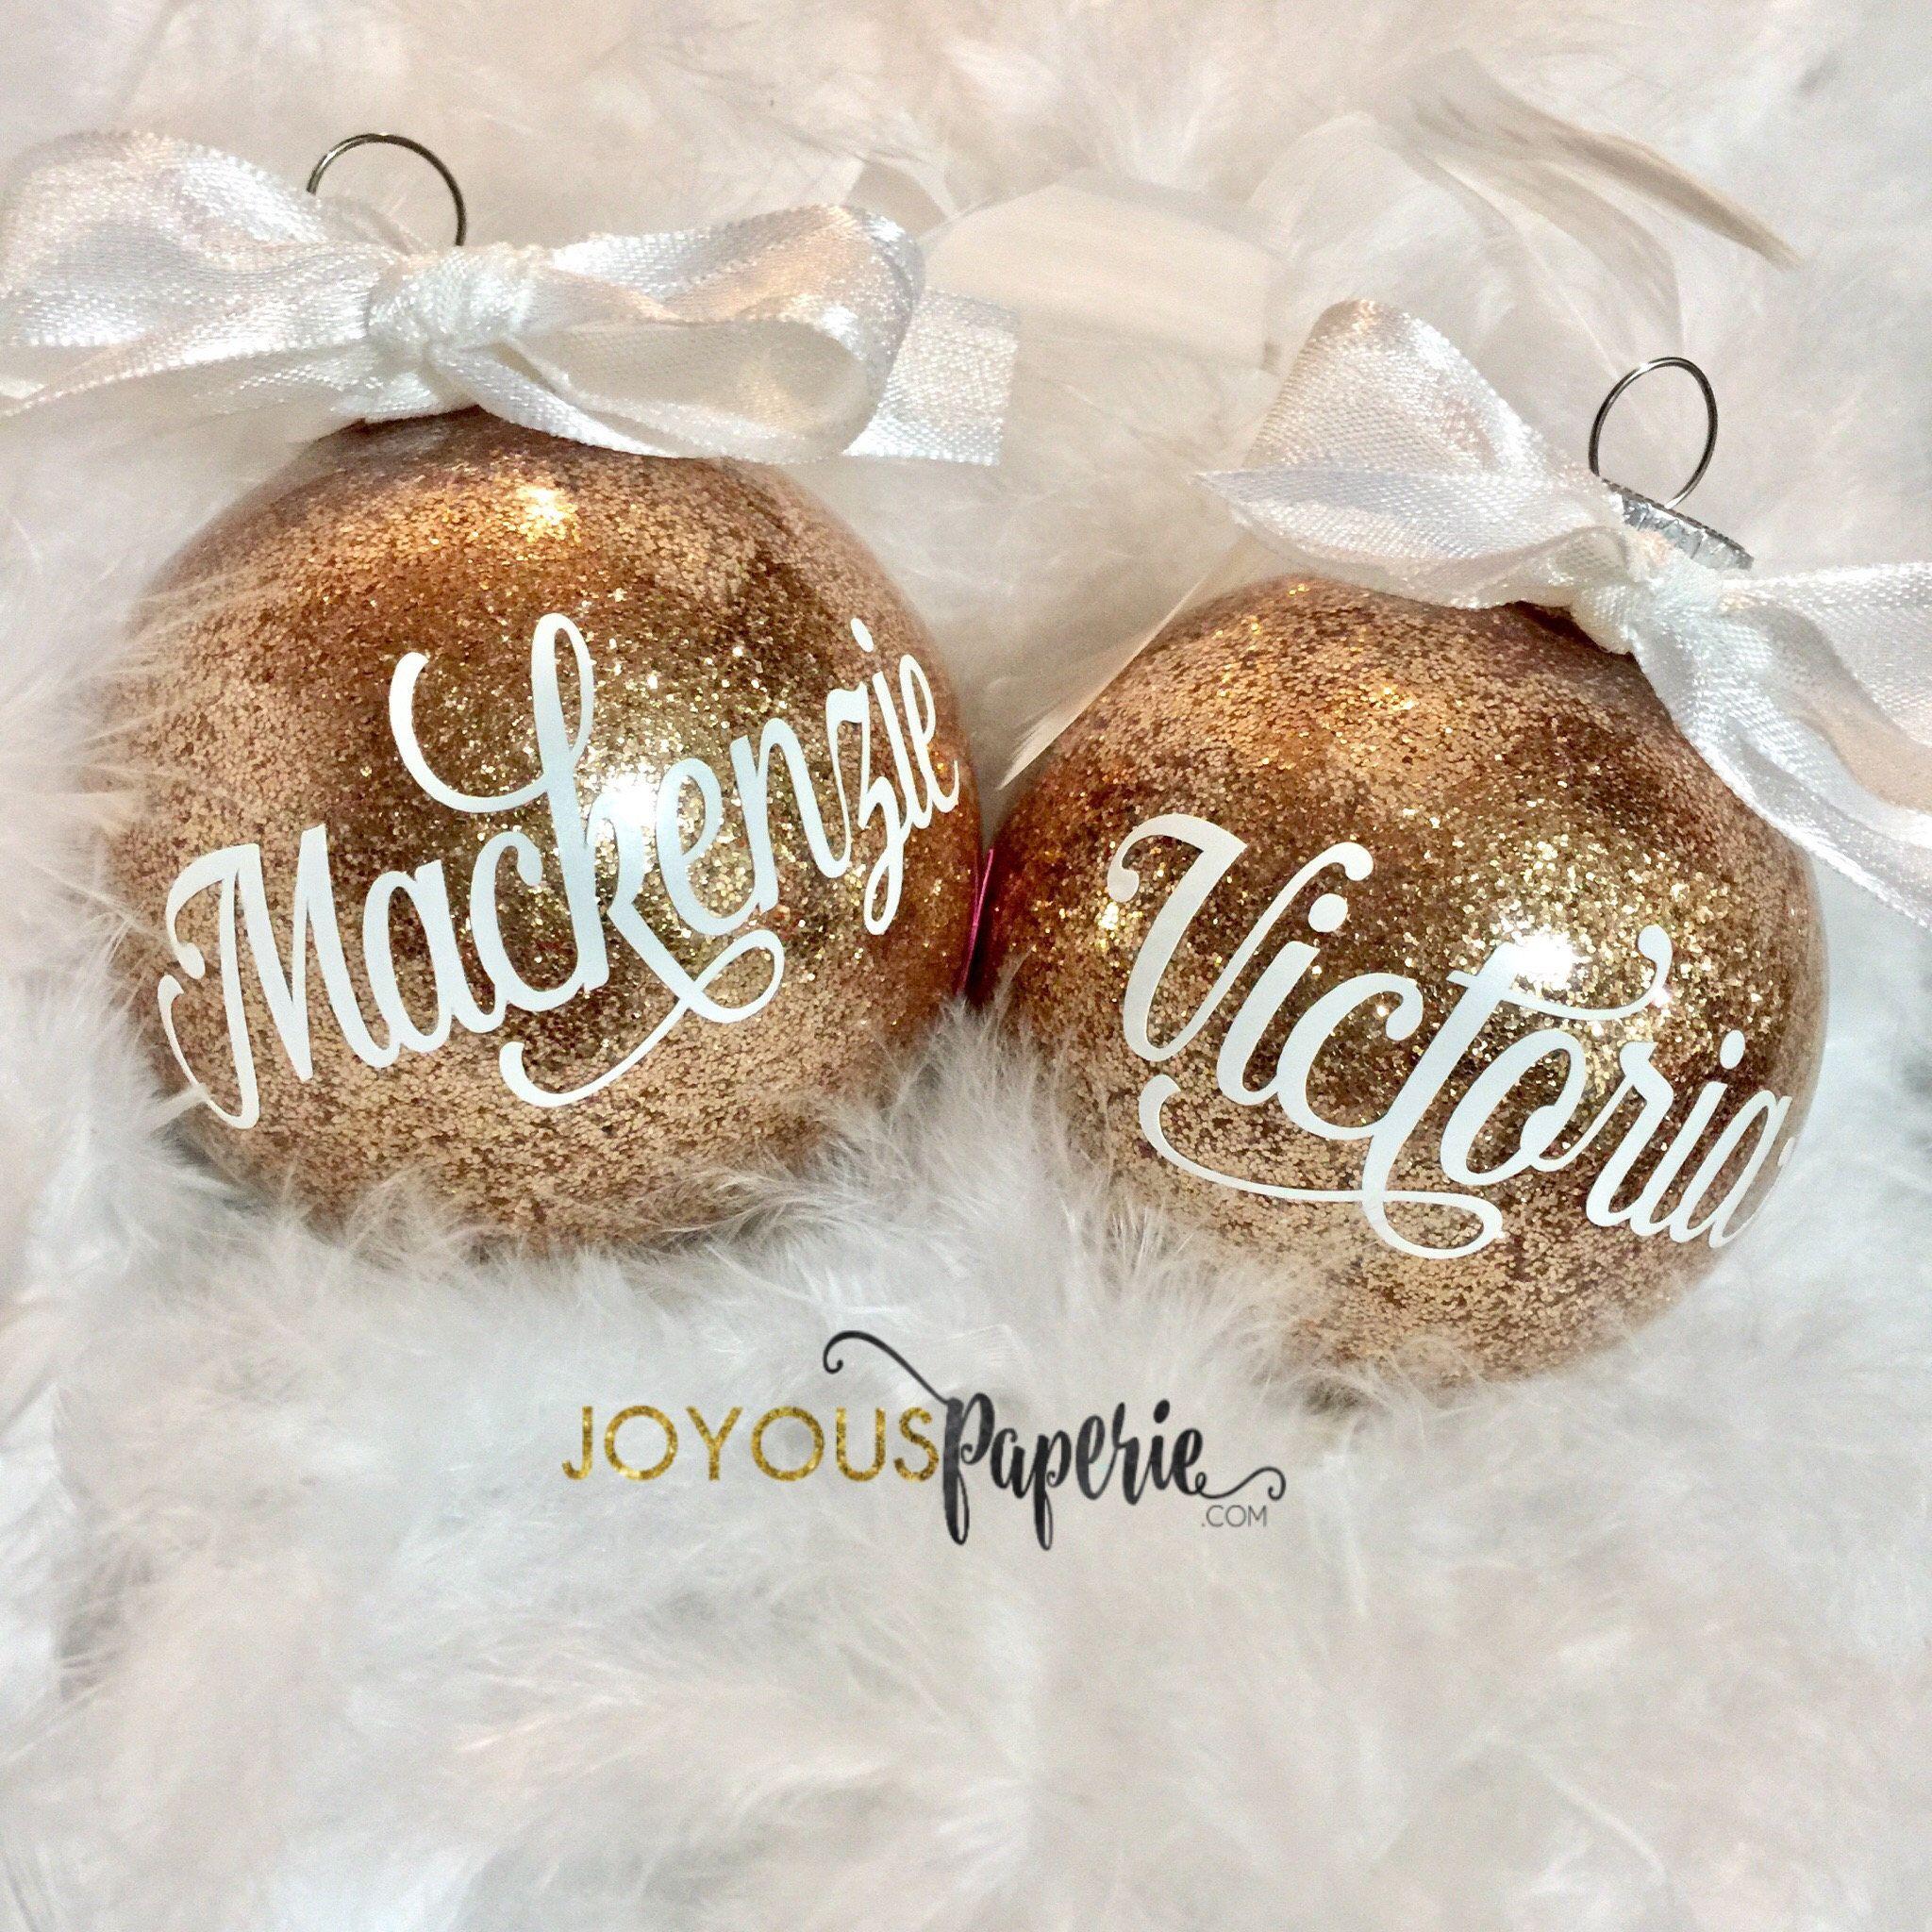 Personalized Ornament Rose Gold White Ornament Christmas Ornament Glitter Ornament Gift For Him Gift For Her Christmas Gifts Personalized Ornaments Custom Ornament Christmas Ornaments